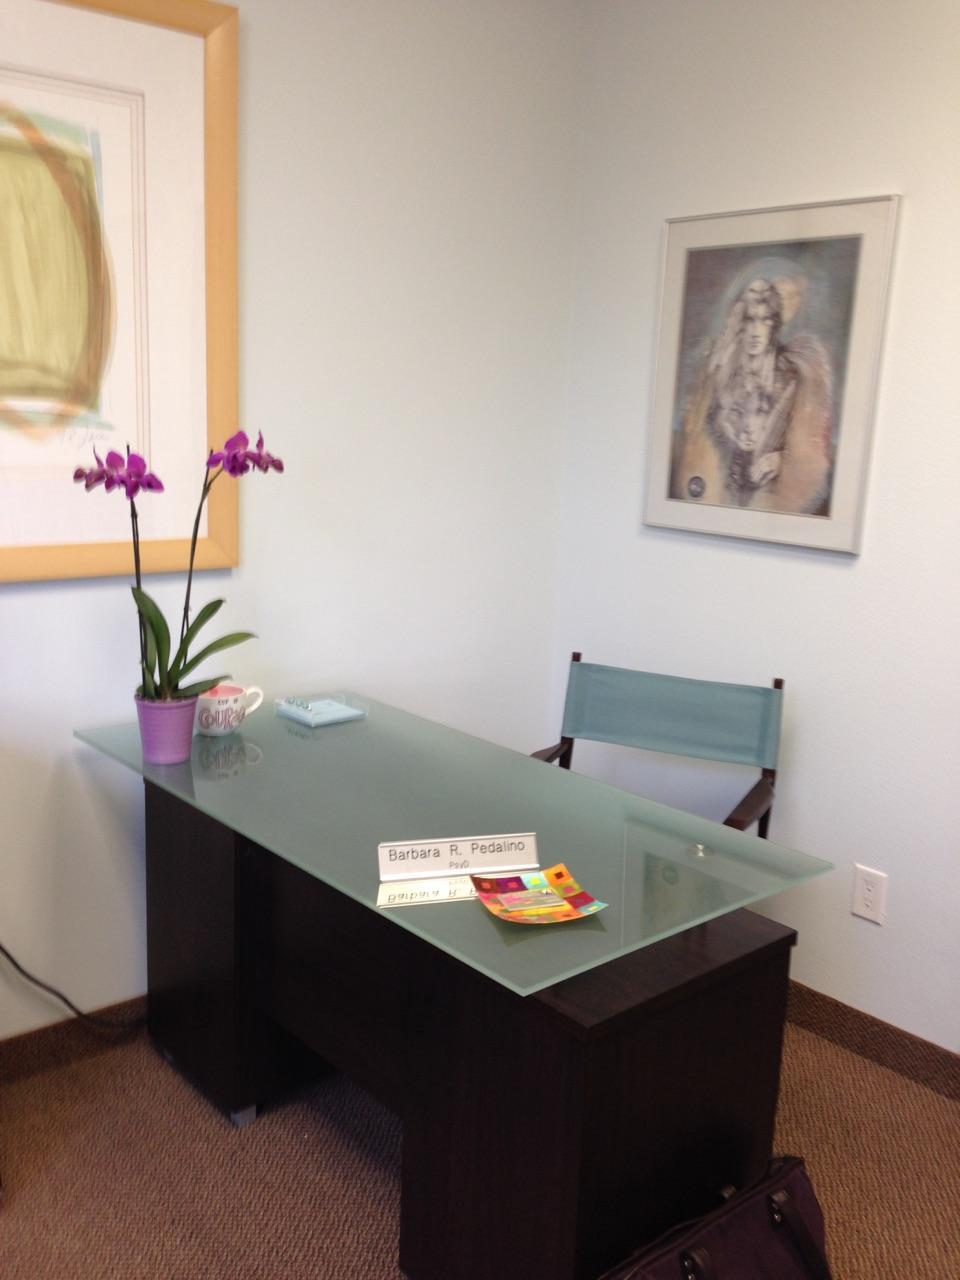 Barbara Pedalino Palm Desert Office 4